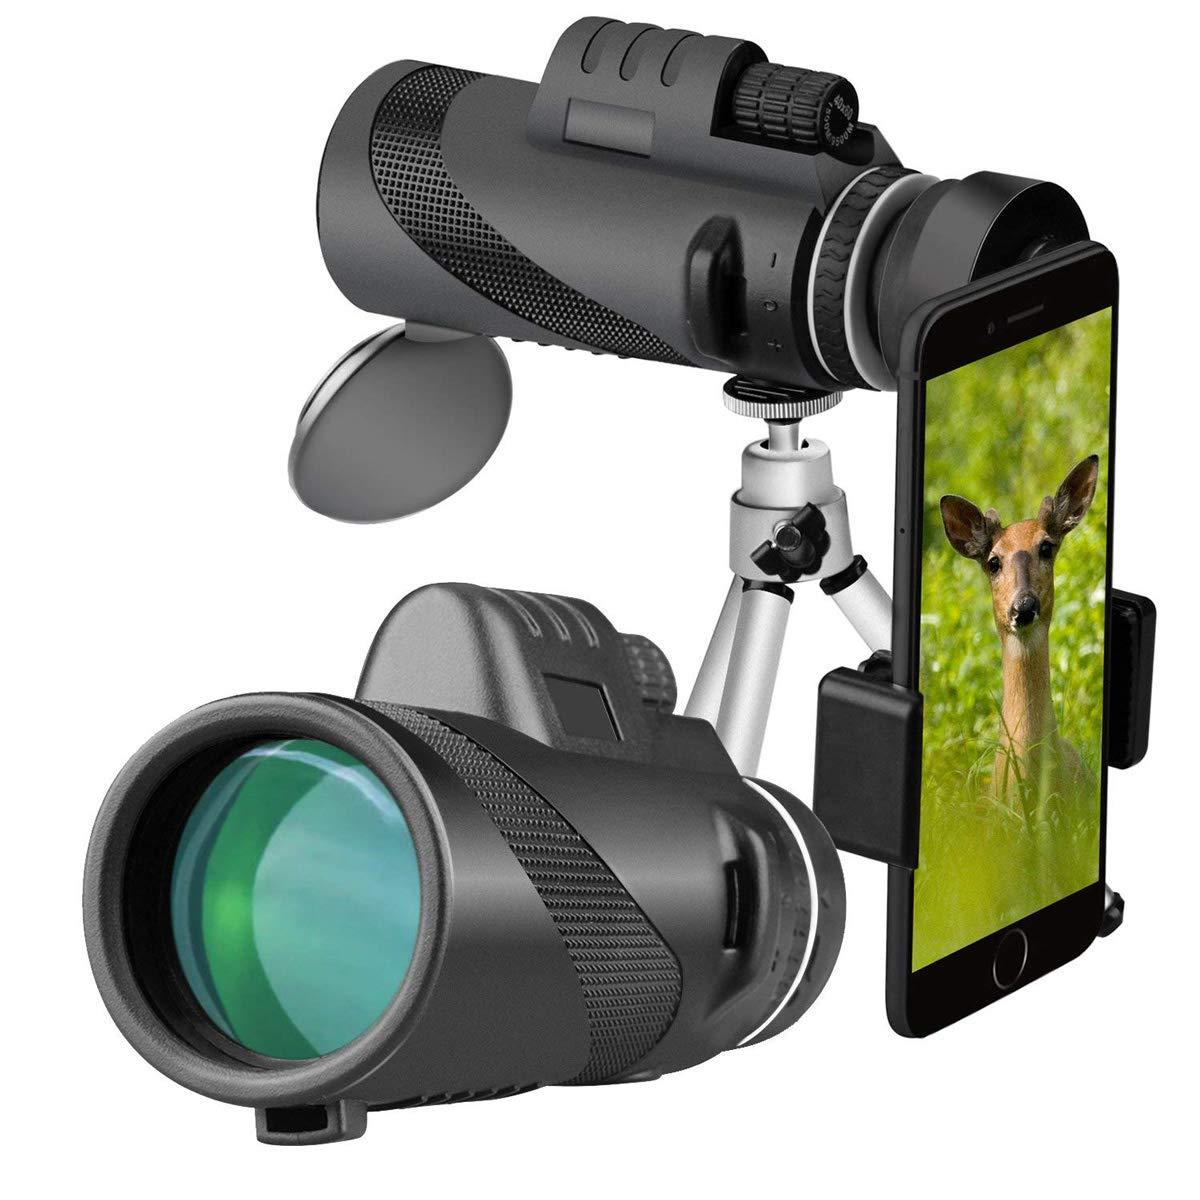 ZDYLL 40X60 High Power Prism Monocular Telescope and Quick Smartphone Holder - Waterproof Fog- Proof Shockproof Scope -BAK4 Prism FMC (Black)